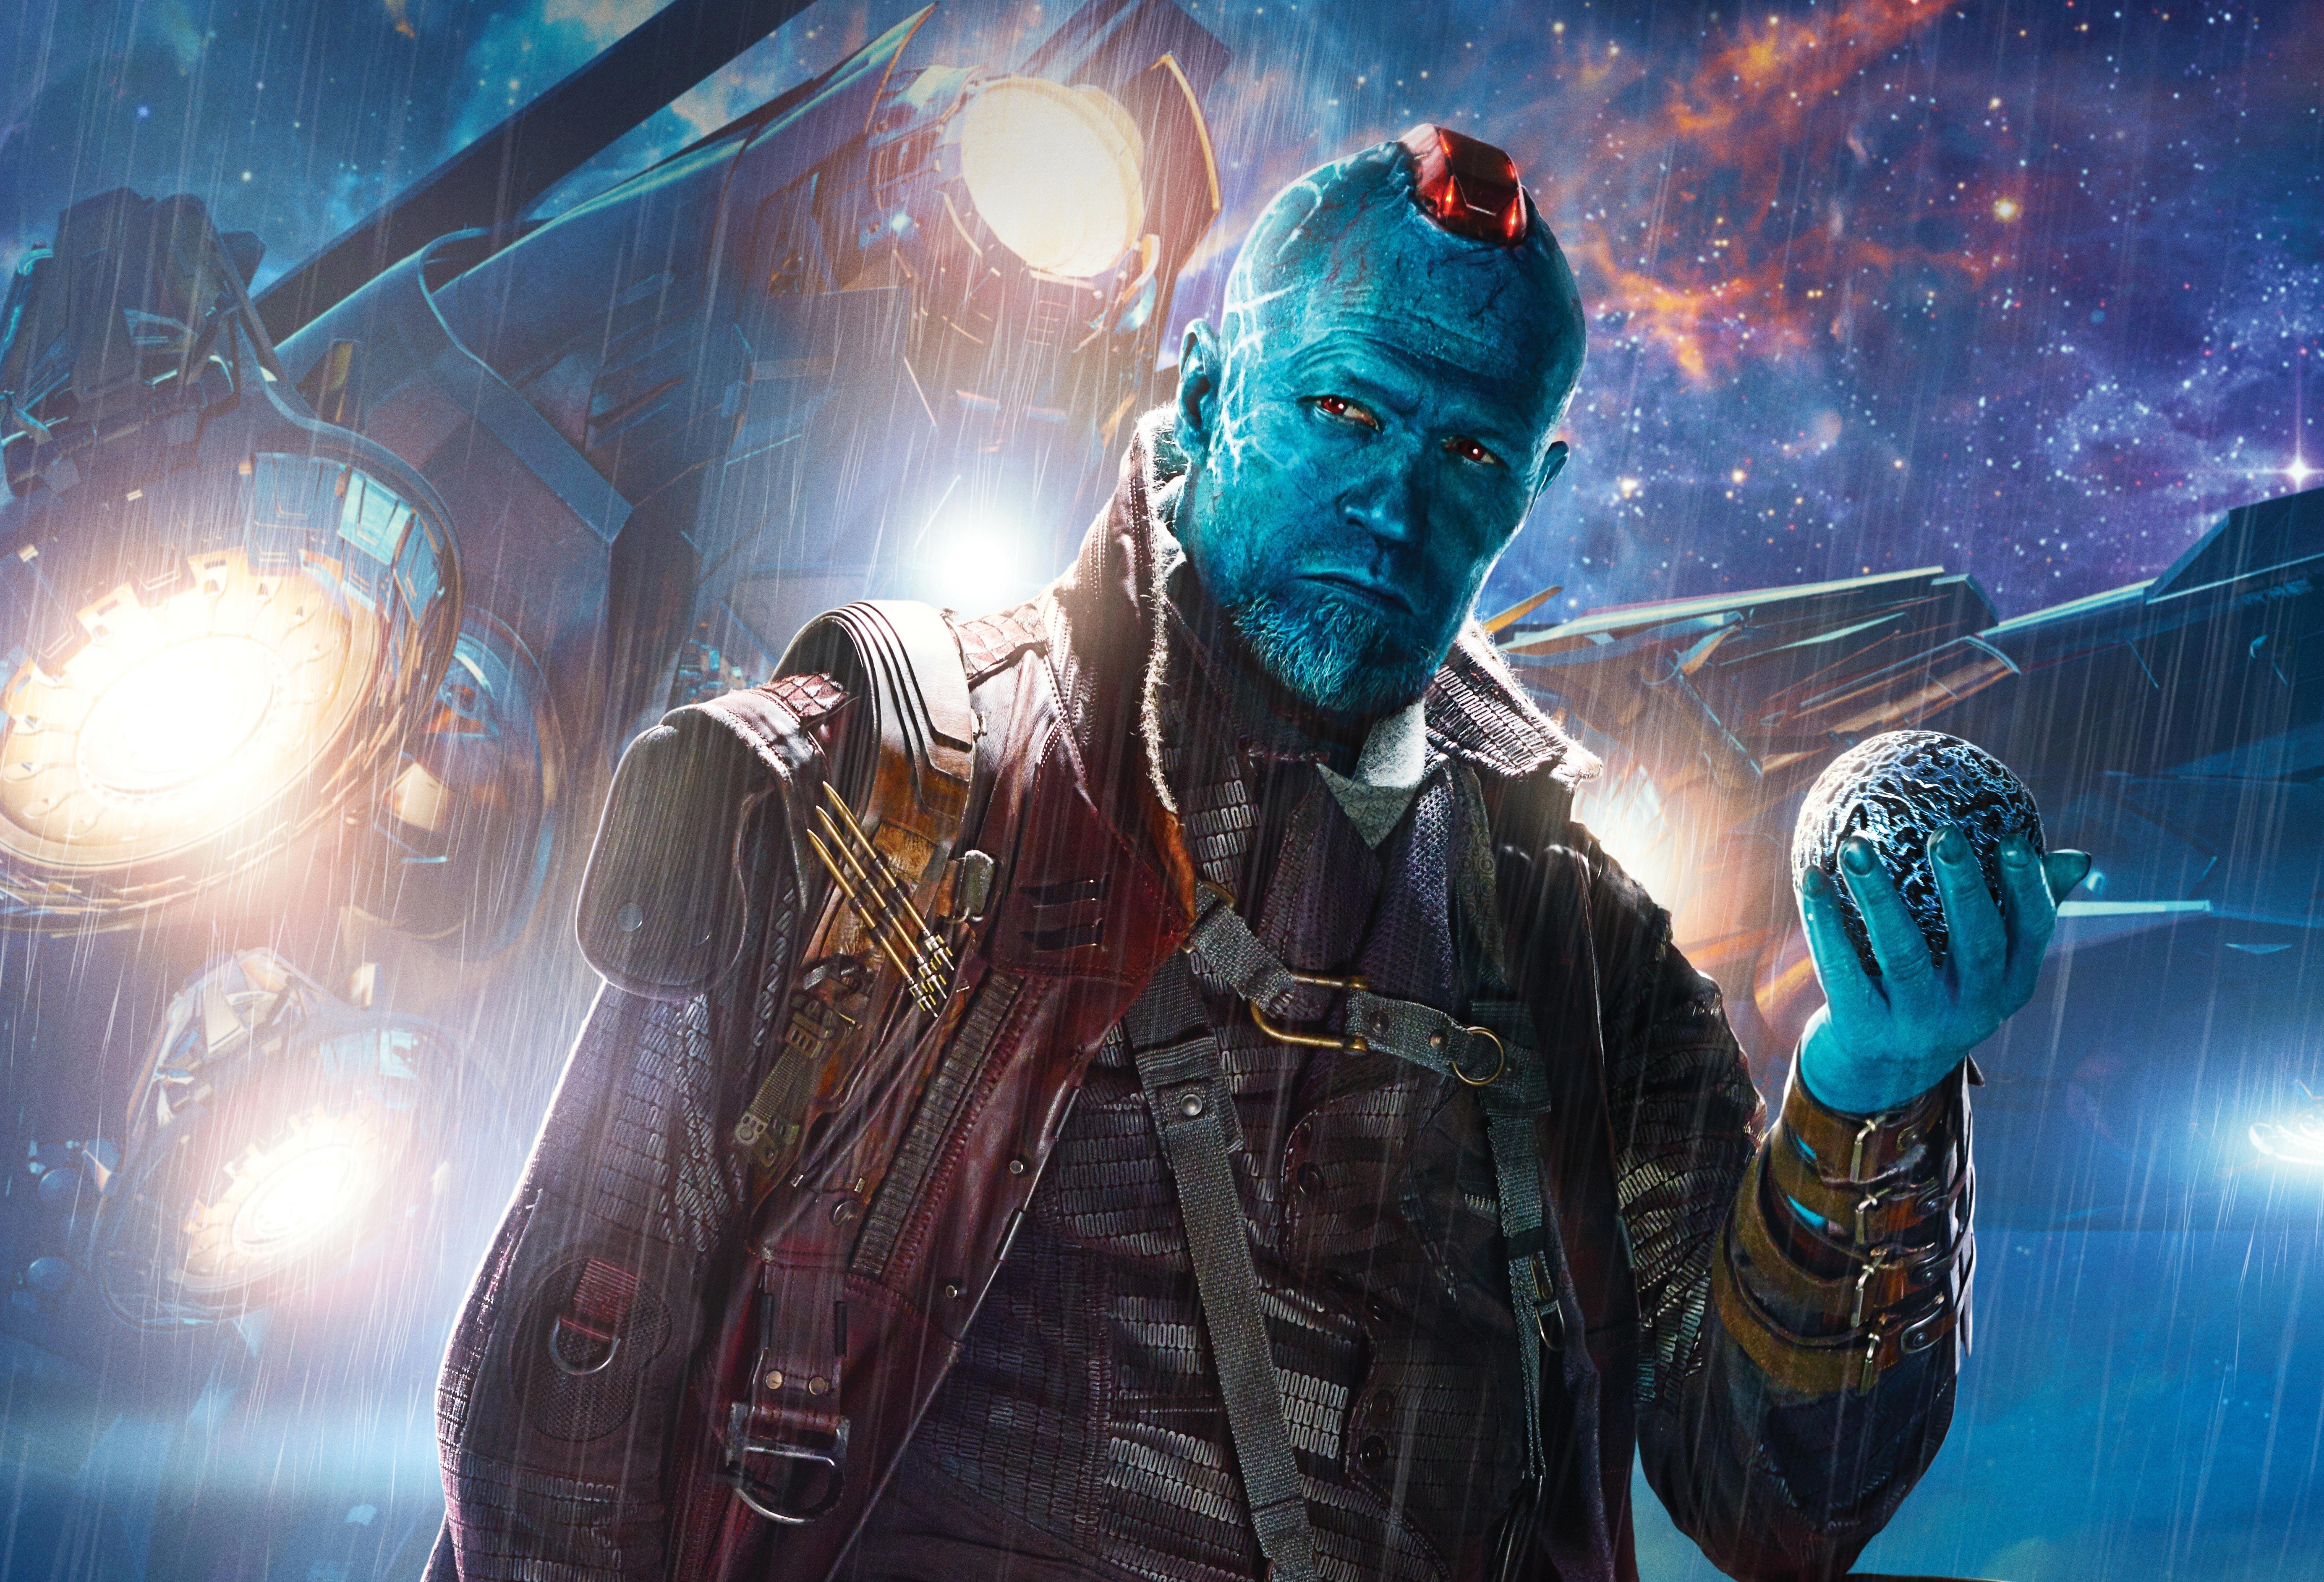 Guardians Of The Galaxy Hd Filme